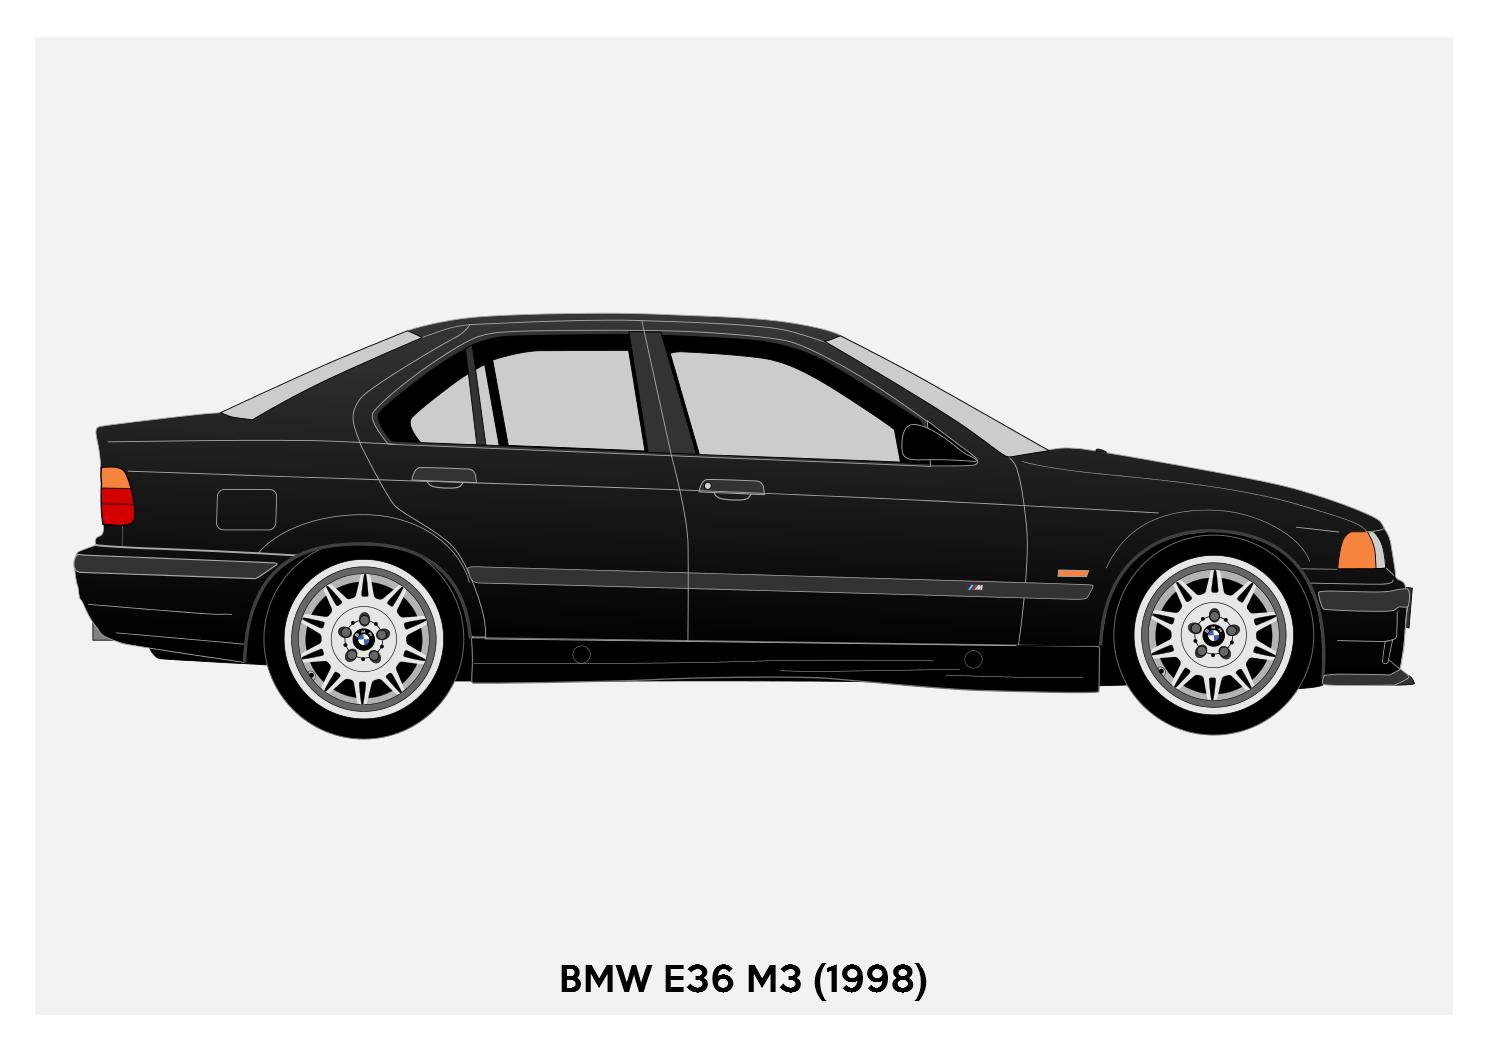 AB100 BMW M4 MOTOGP SAFETY CAR CAR POSTER Photo Poster Print Art * All Sizes